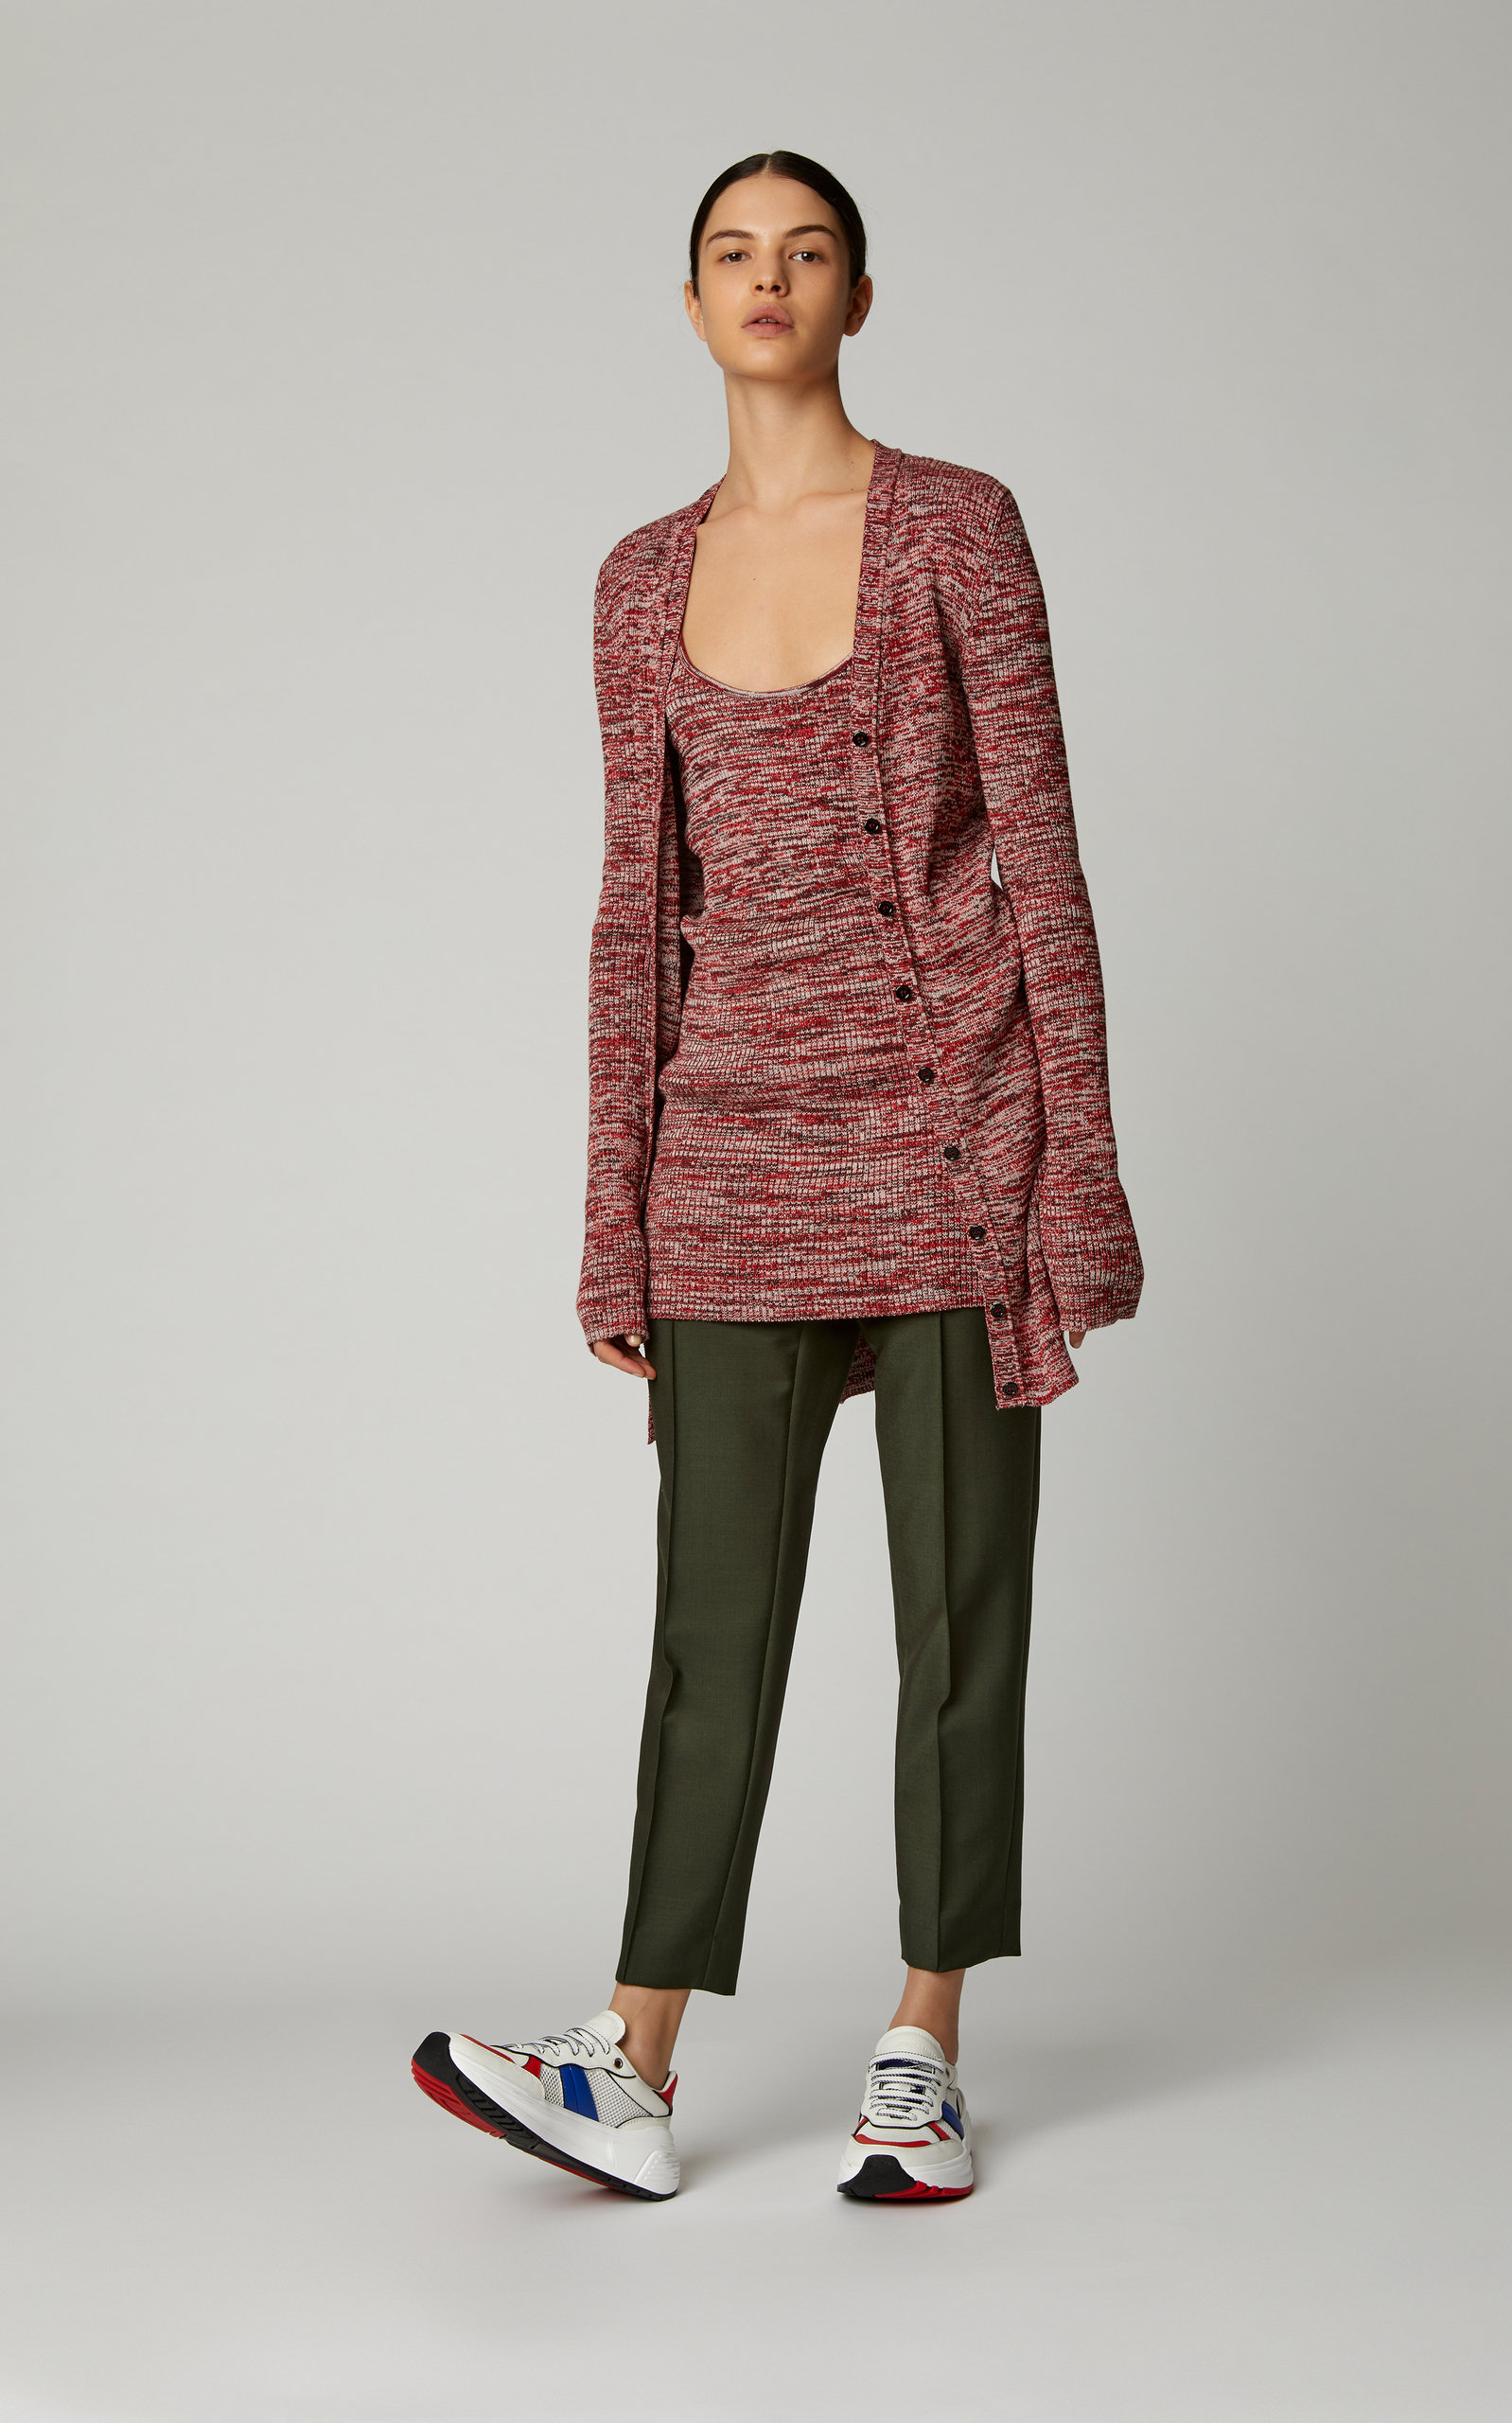 BOTTEGA VENETA Tanks Marled Rib-Knit Cotton Cardigan